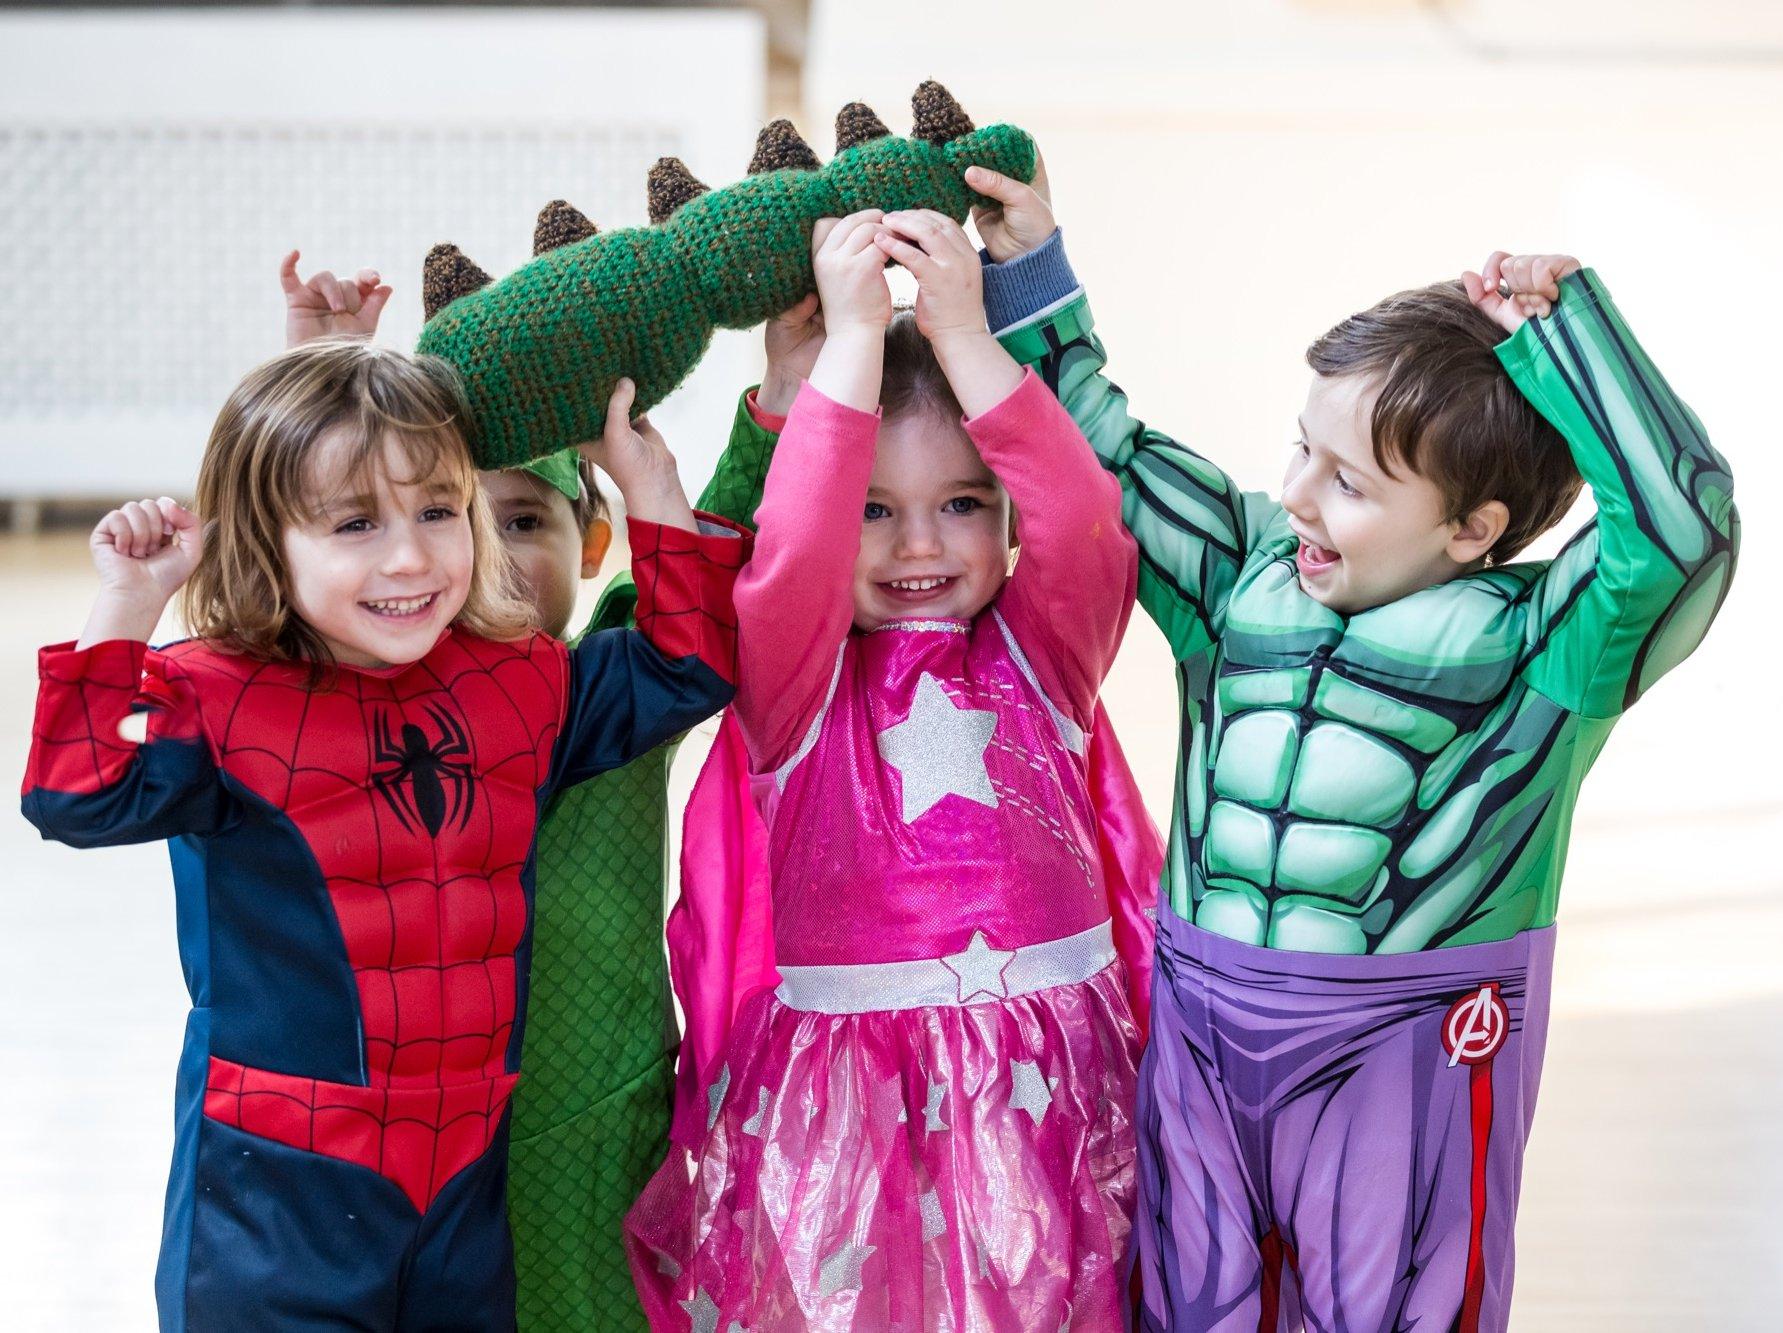 The Little Hero Company image